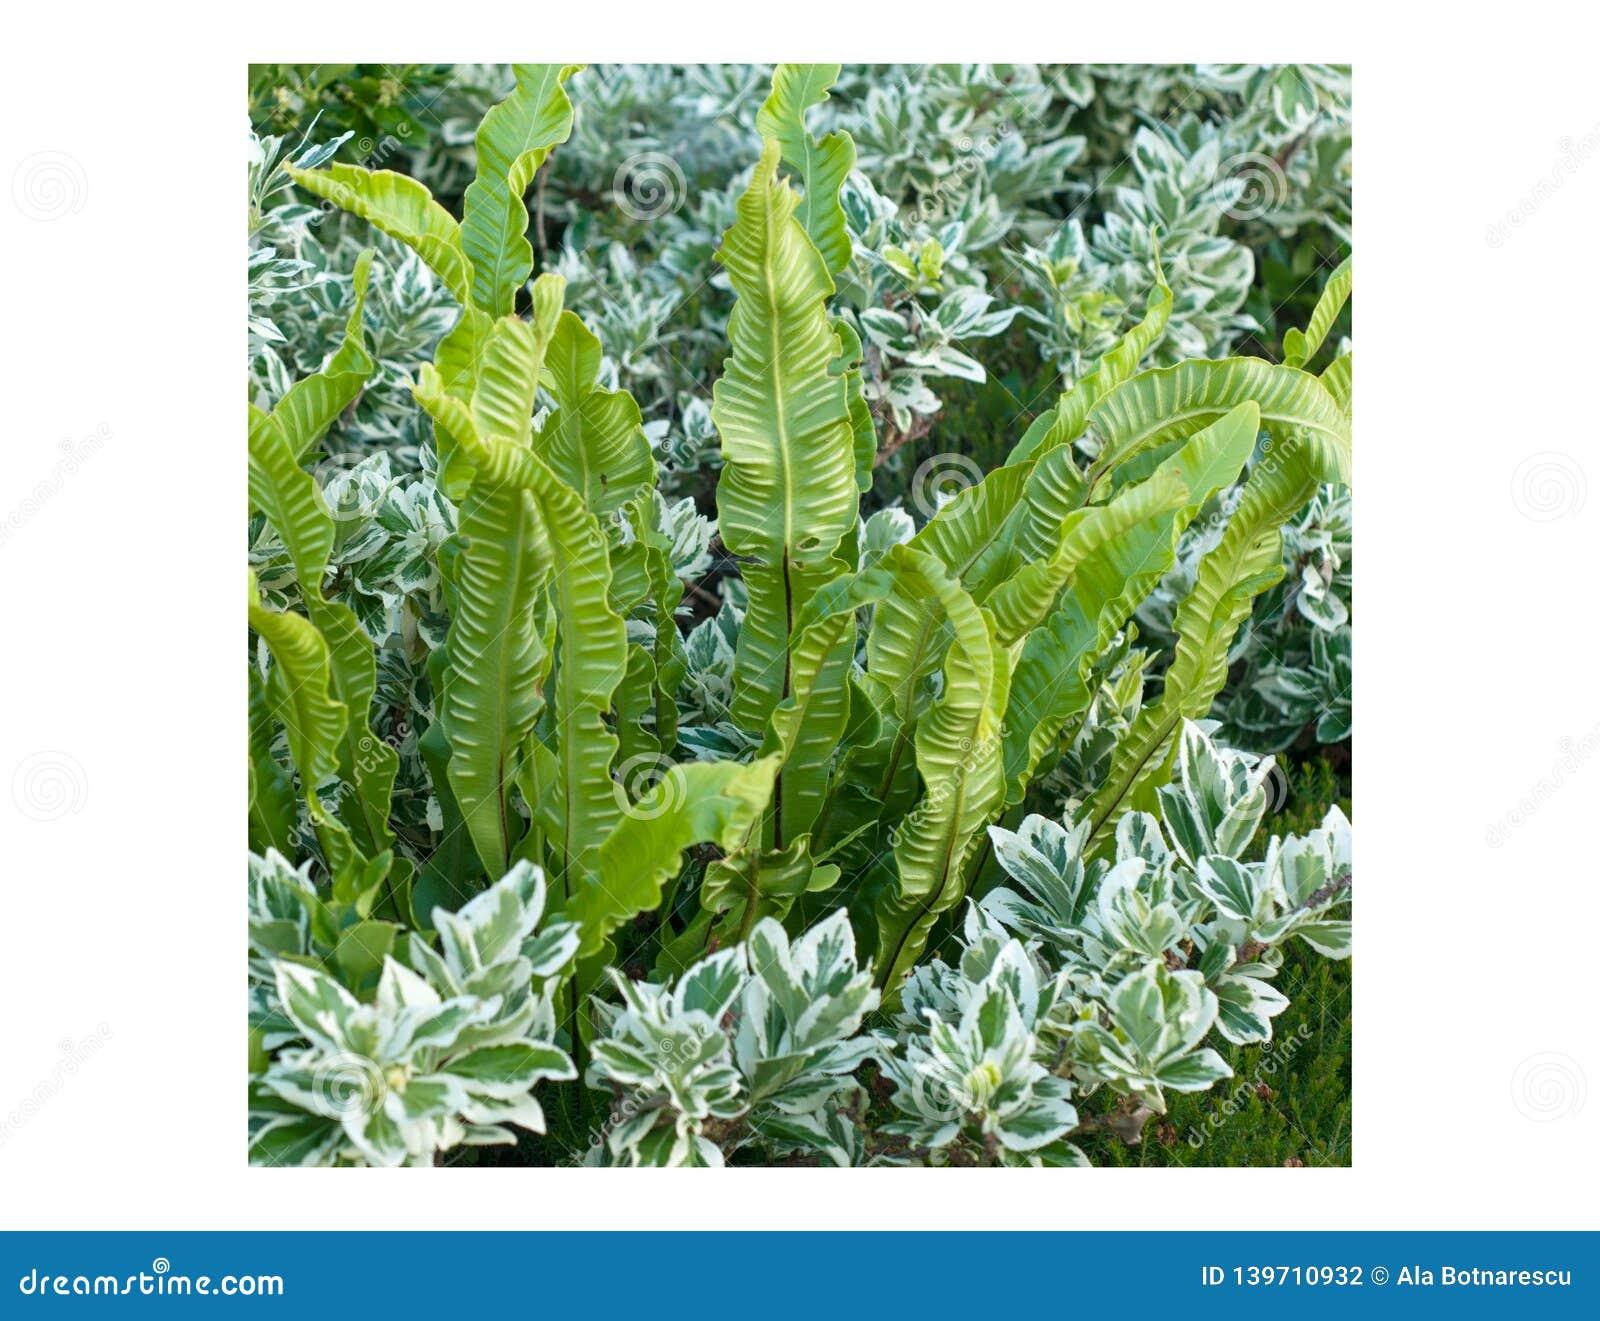 A beautiful combination of Hart`s-tongue fern Asplenium scolopendrium and Parennials shrub